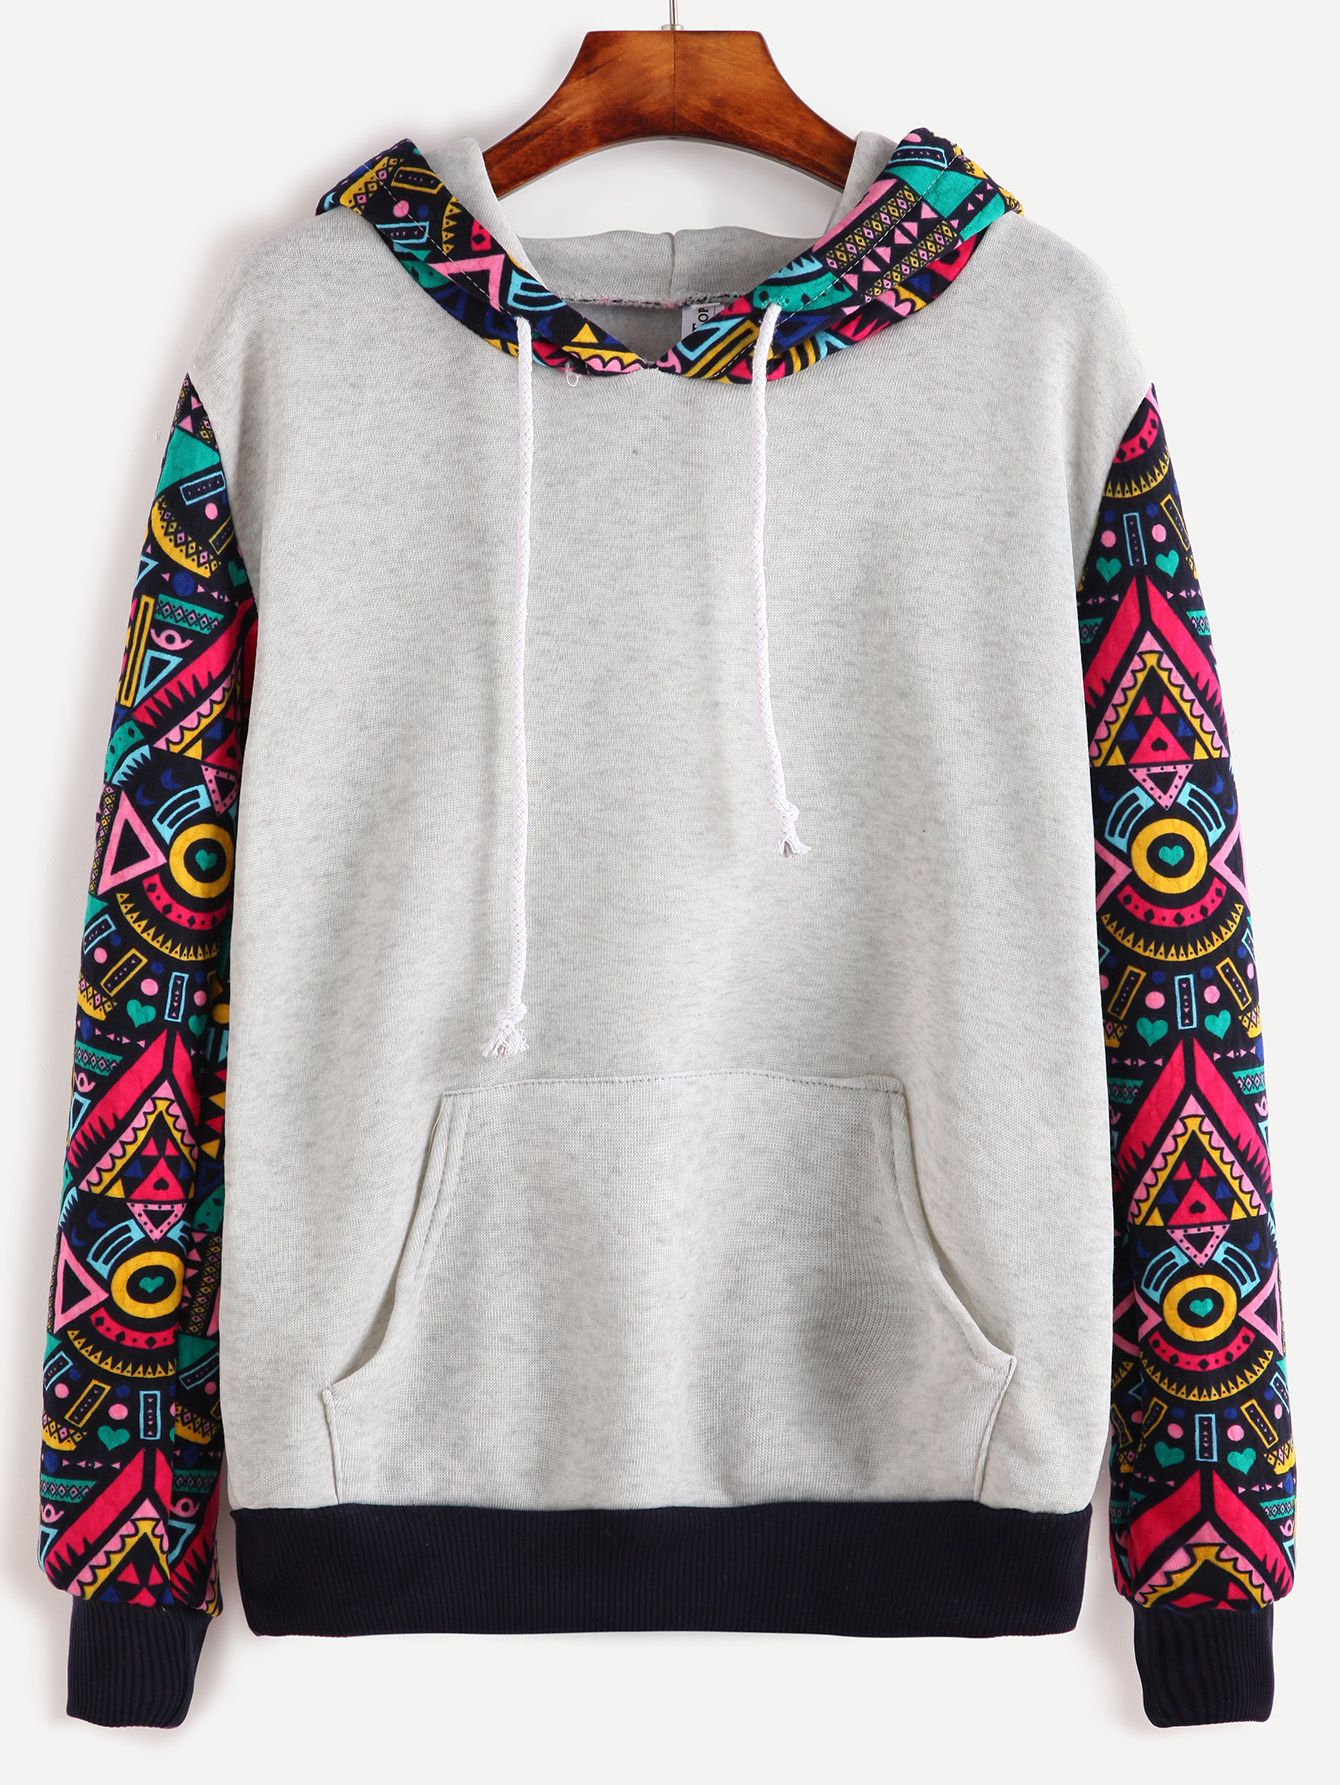 kapuzensweatshirt kontrast rmel grau nagellack kleidung und kleider. Black Bedroom Furniture Sets. Home Design Ideas